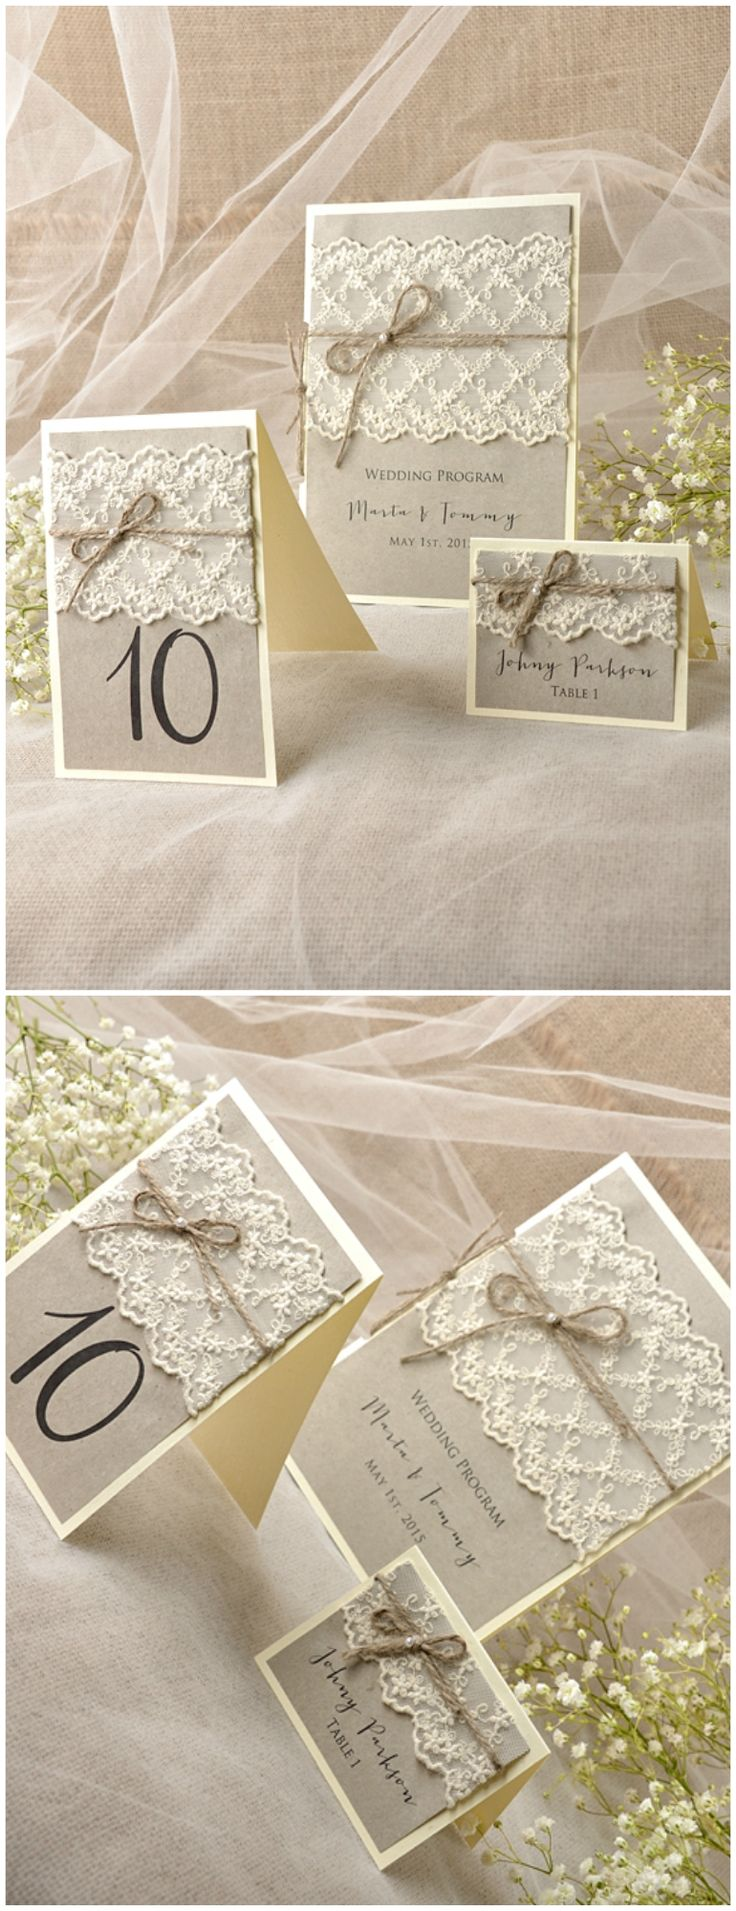 Rustic Lace Wedding Stationery #weddingideas #rustic #wedding #lace #romantic #calligraphy #eco #ecofriendly